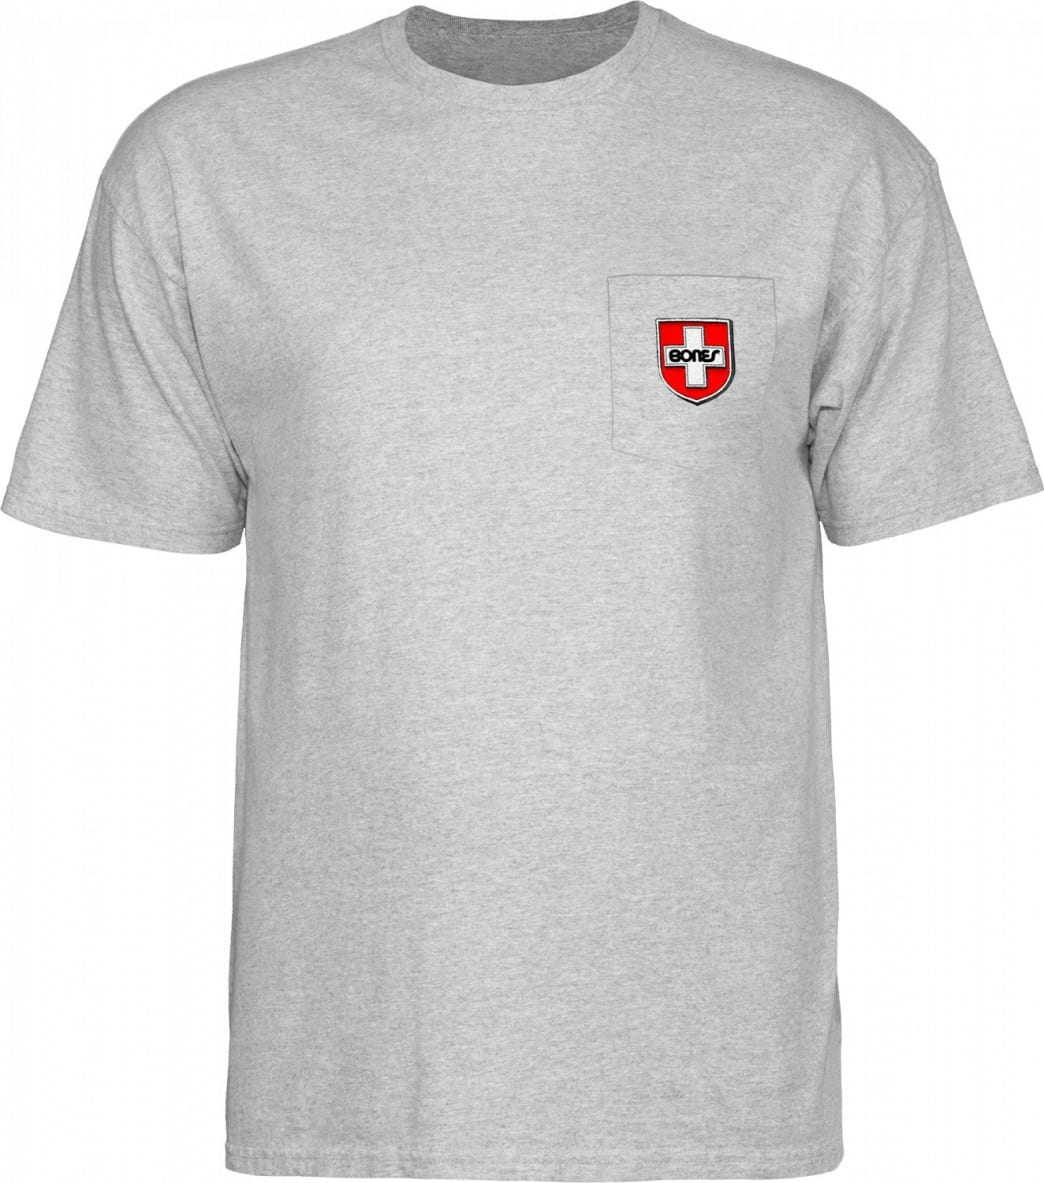 Bones Swiss Shield Pocket (Heather) | T-Shirt by Bones 1